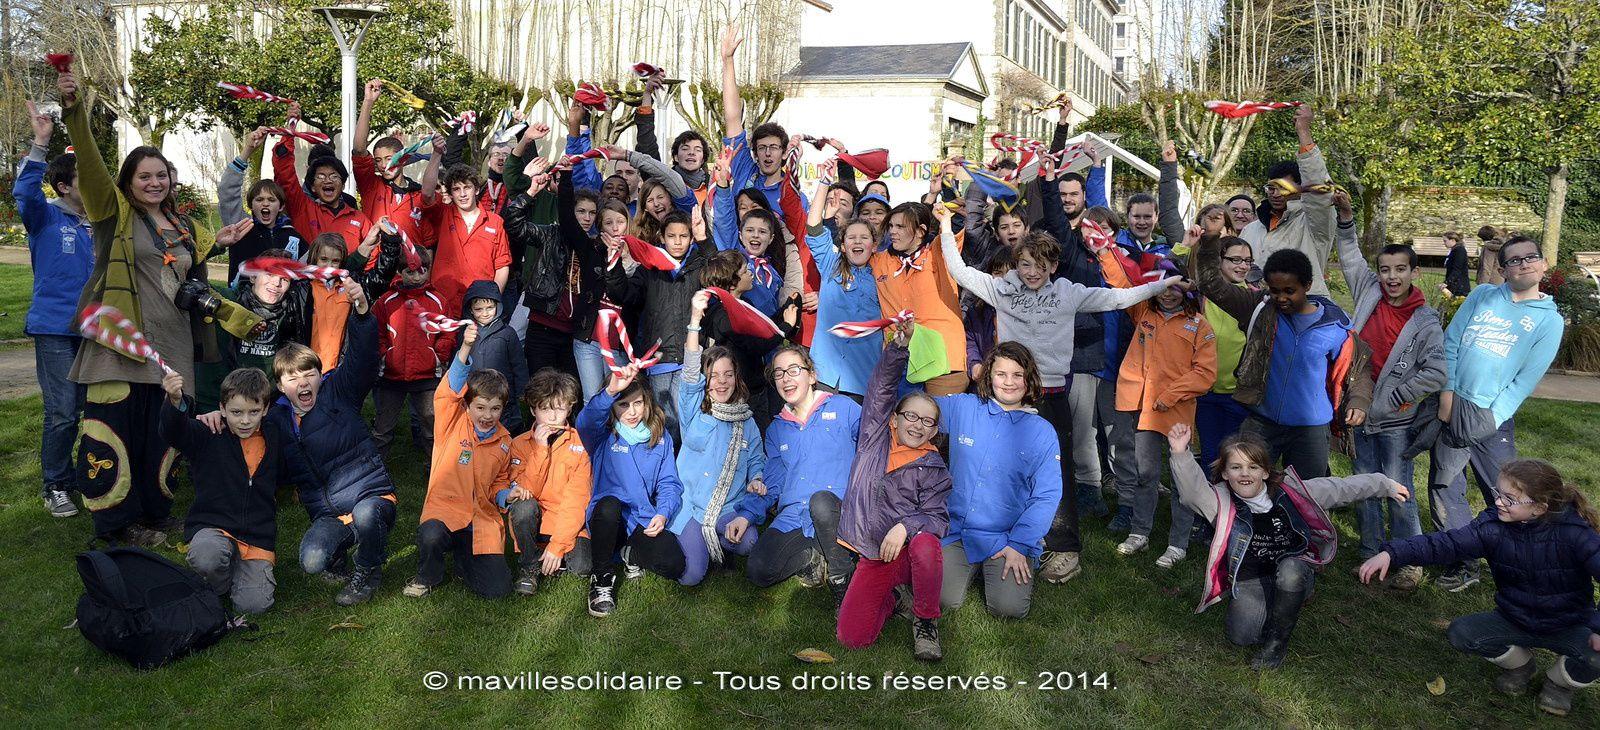 Journée mondiale du scoutisme au square bayard la Roche-sur-Yon.